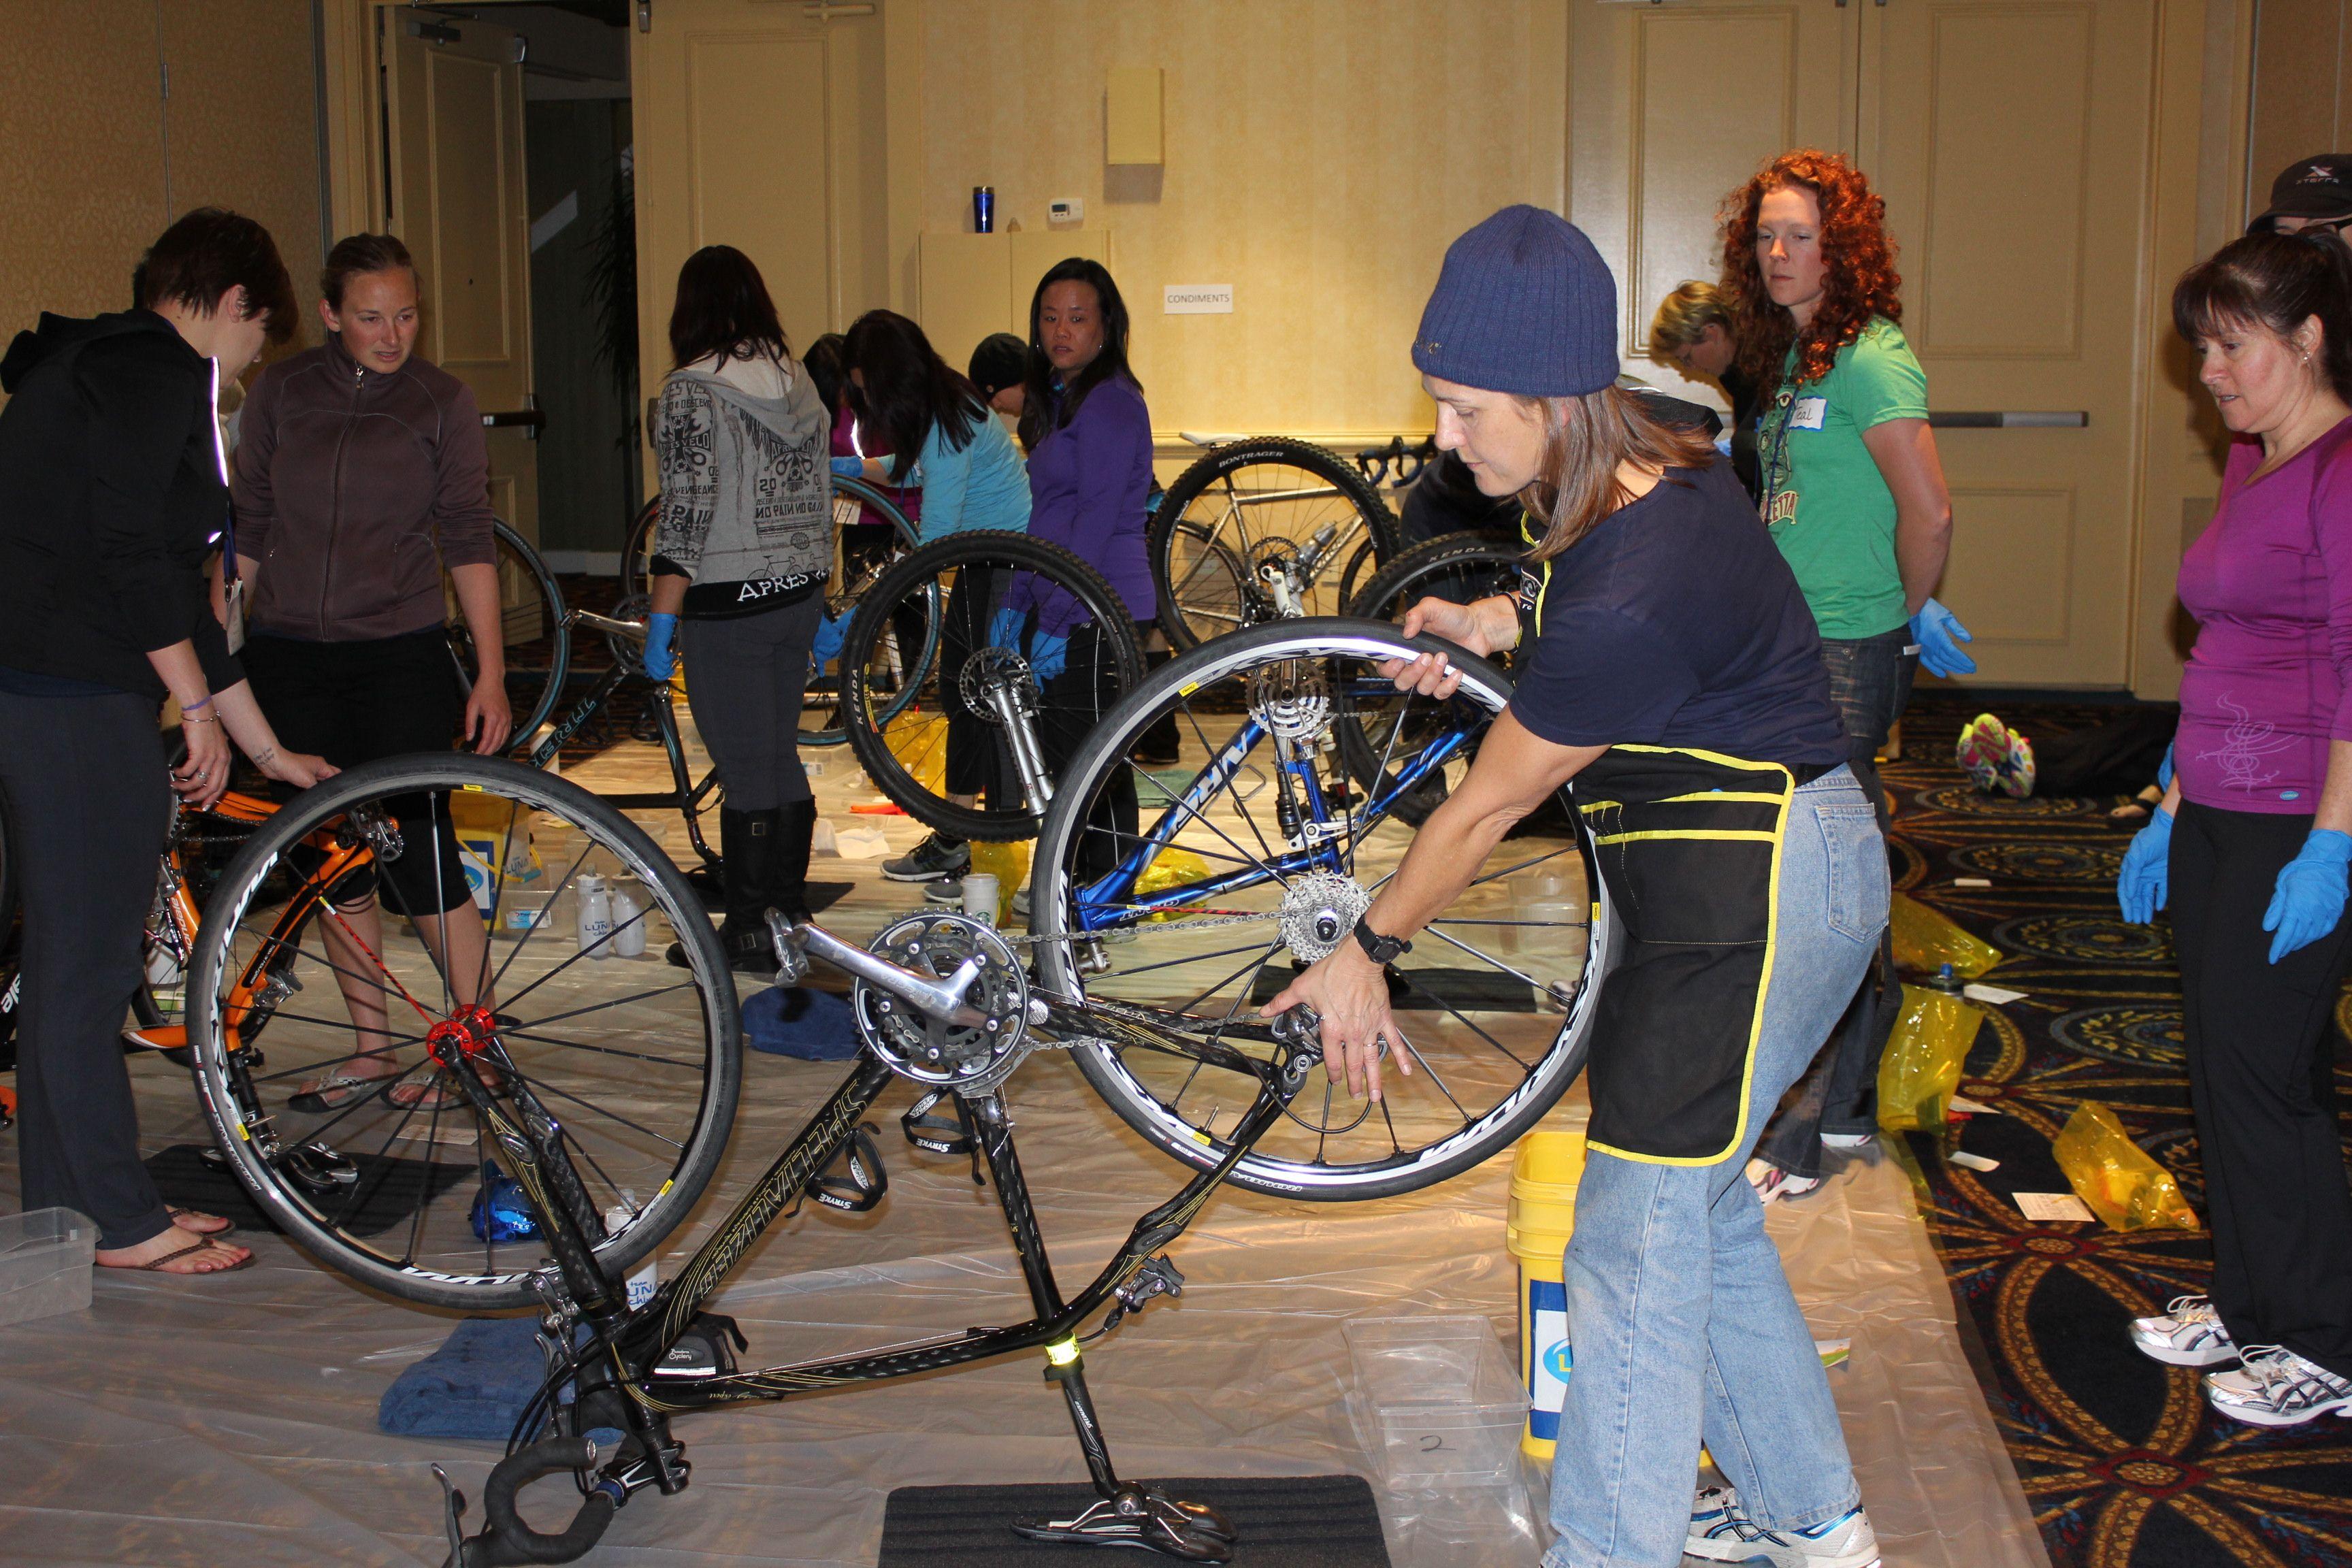 Basic Bike Care Clinic - LUNA Summit, San Francisco, Apr 2012